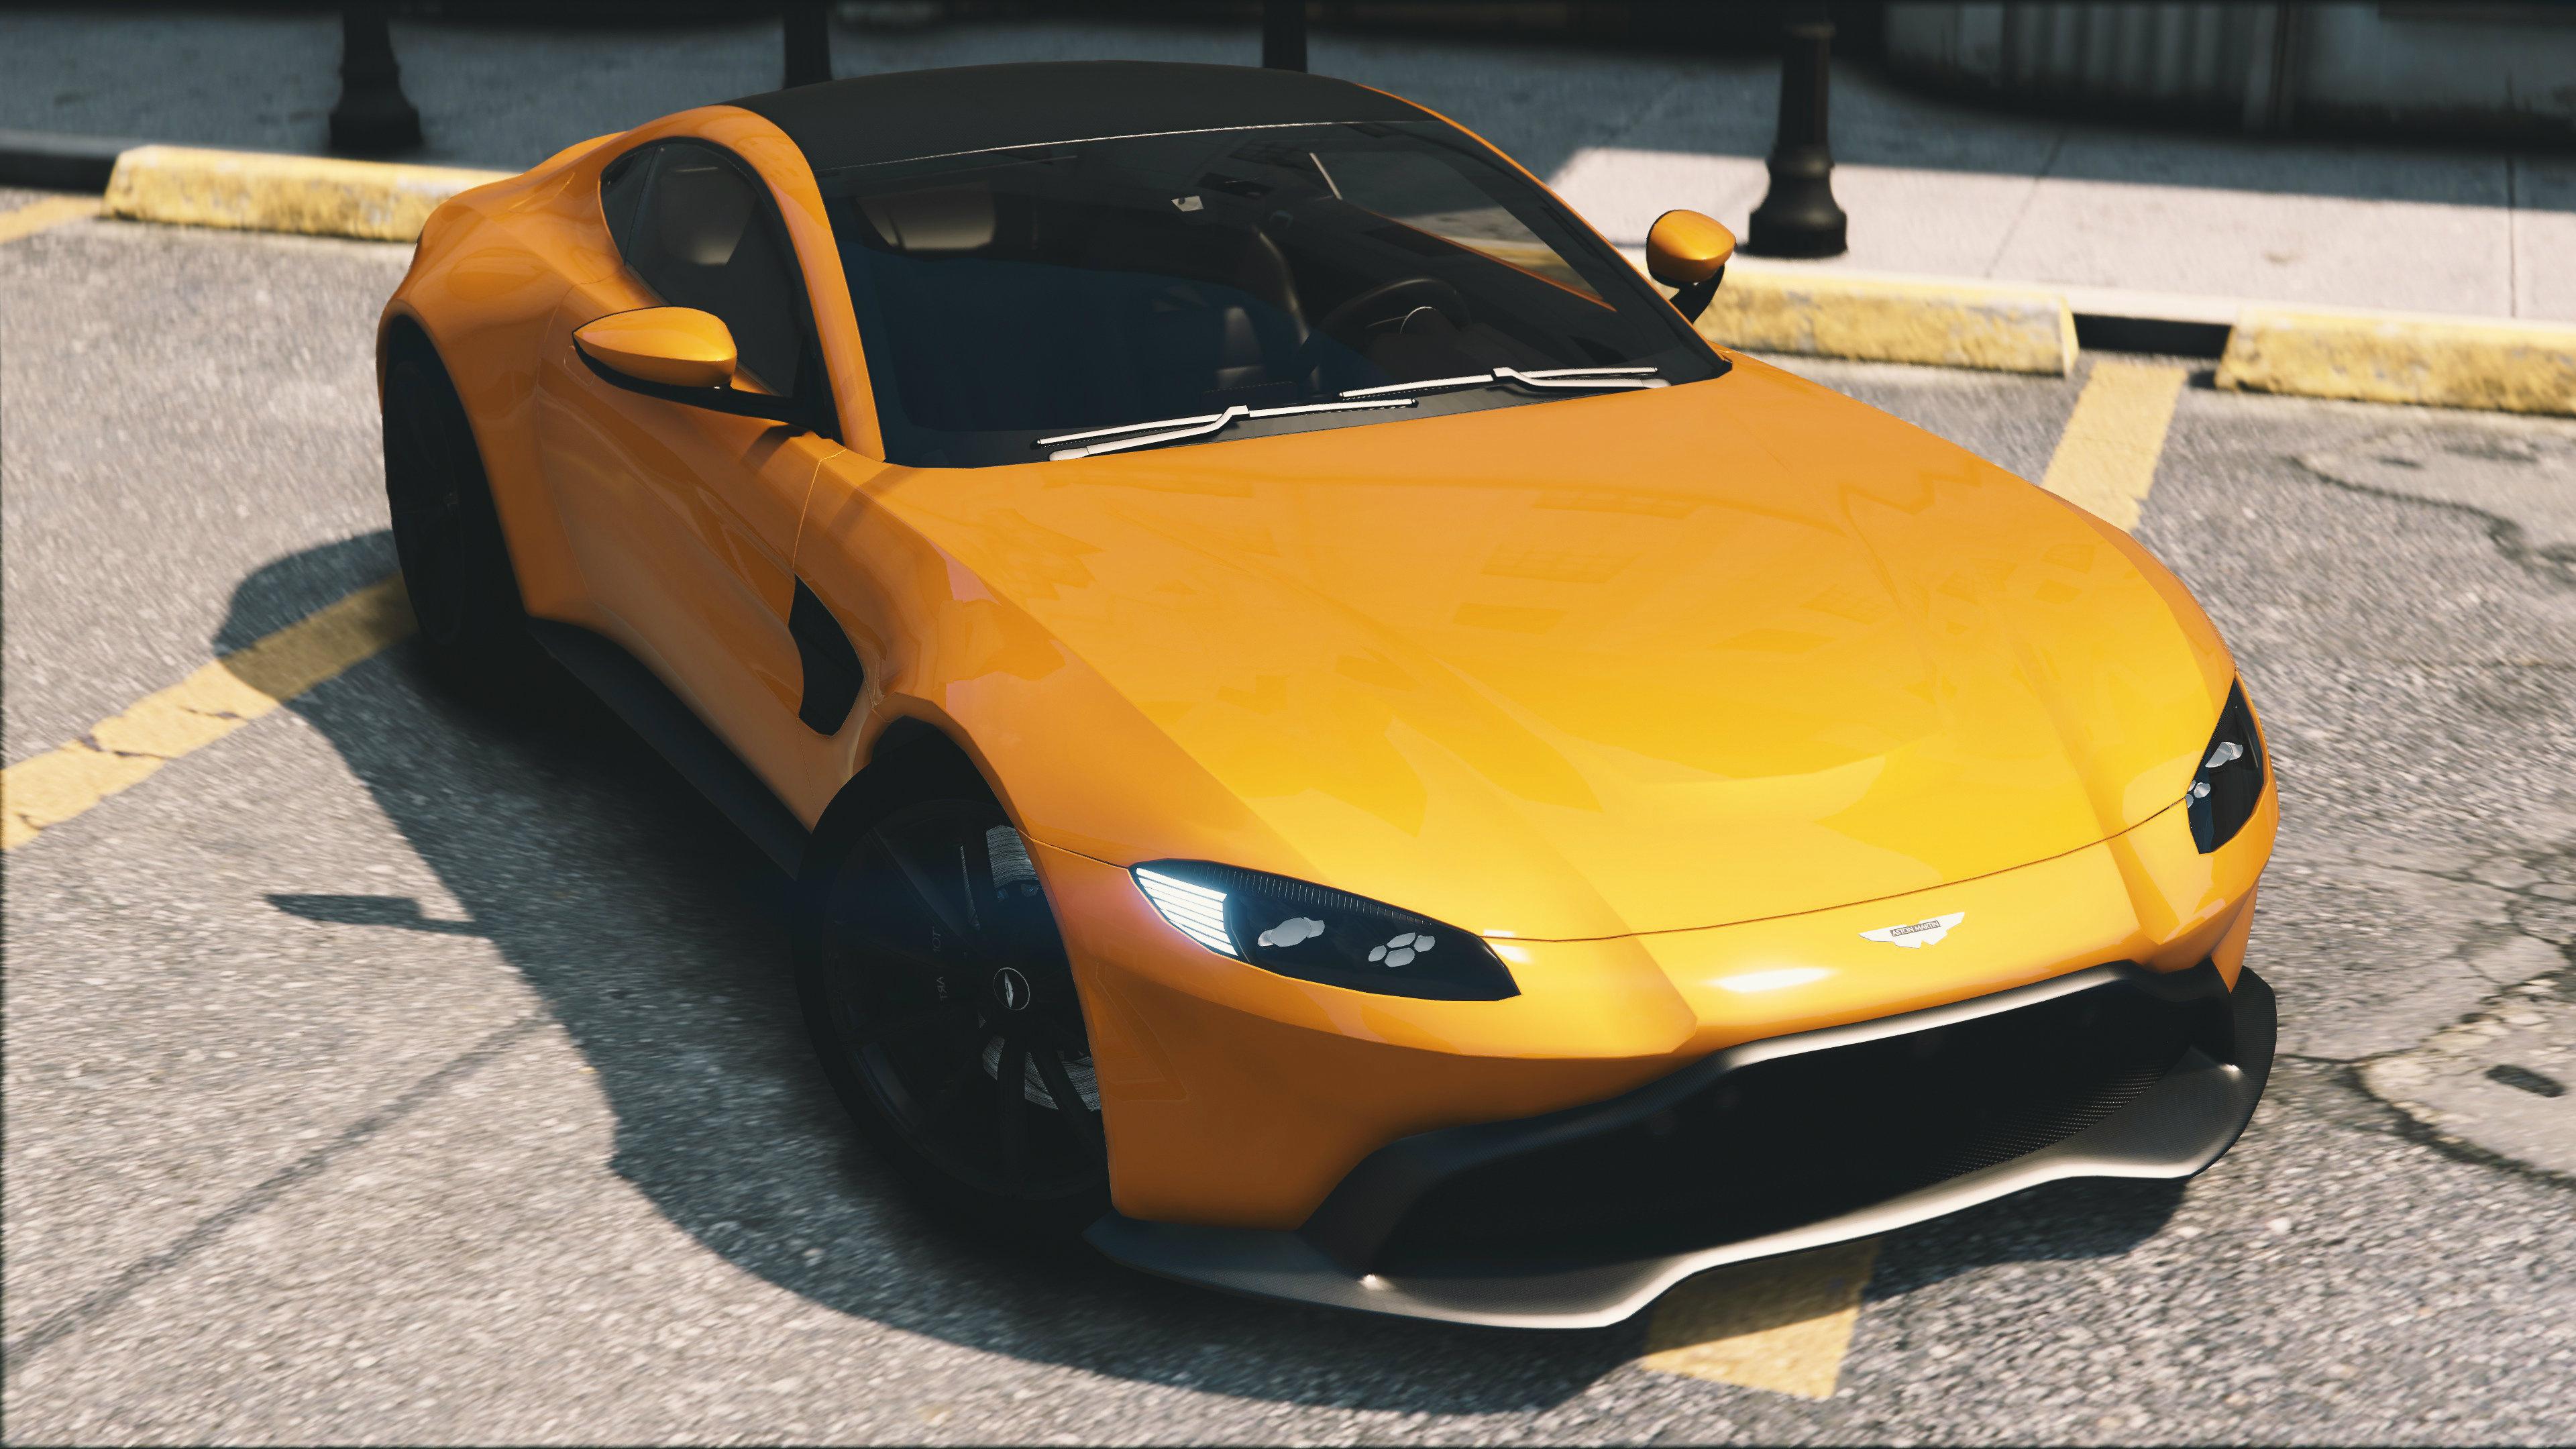 Img Gta5 Mods Com Q95 Images Aston Martin Vantage